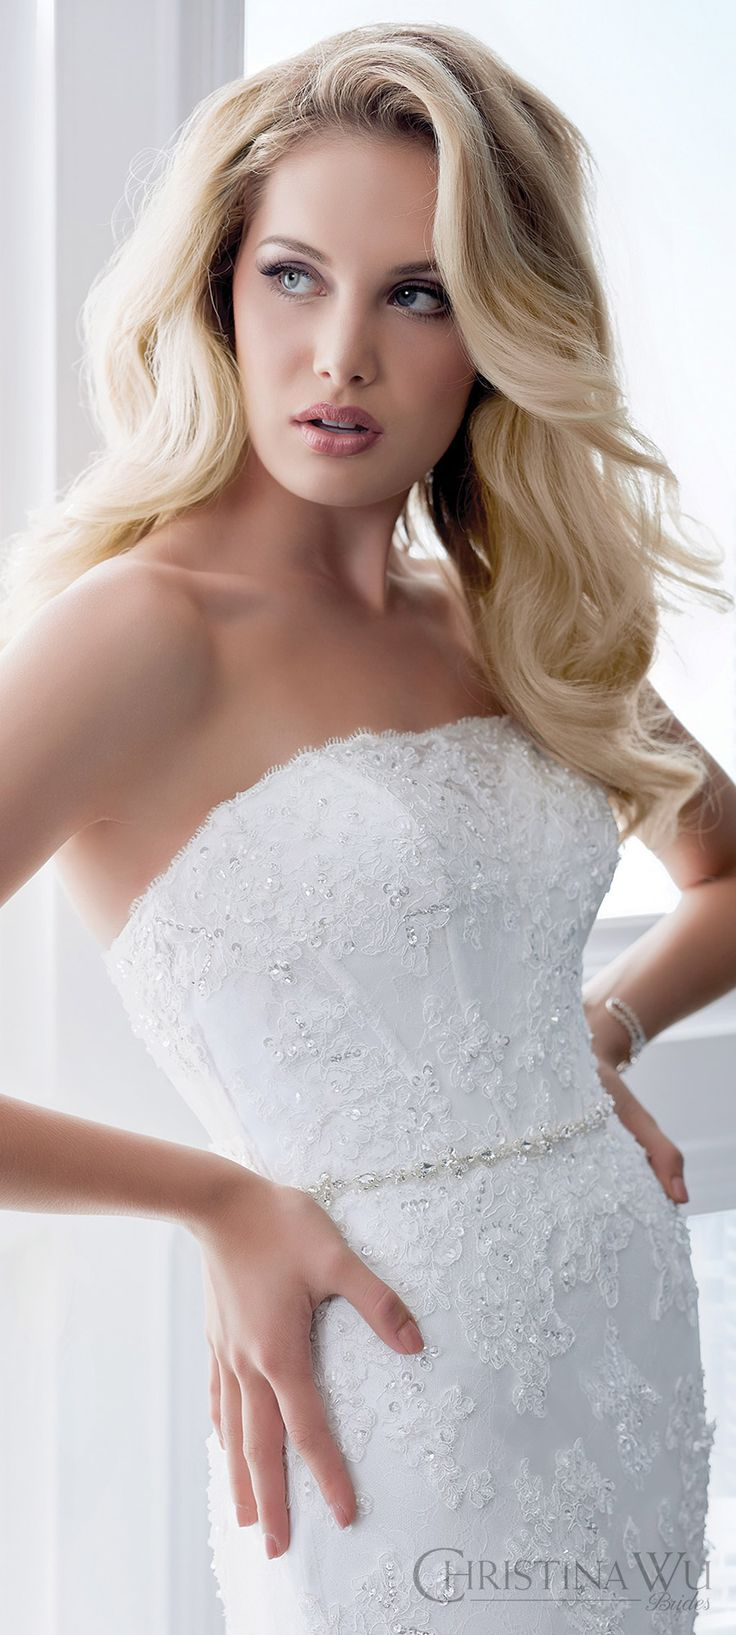 christina wu brides spring 2017 bridal strapless straight across beaded corset bodice fit flare lace wedding dress (15618) mv